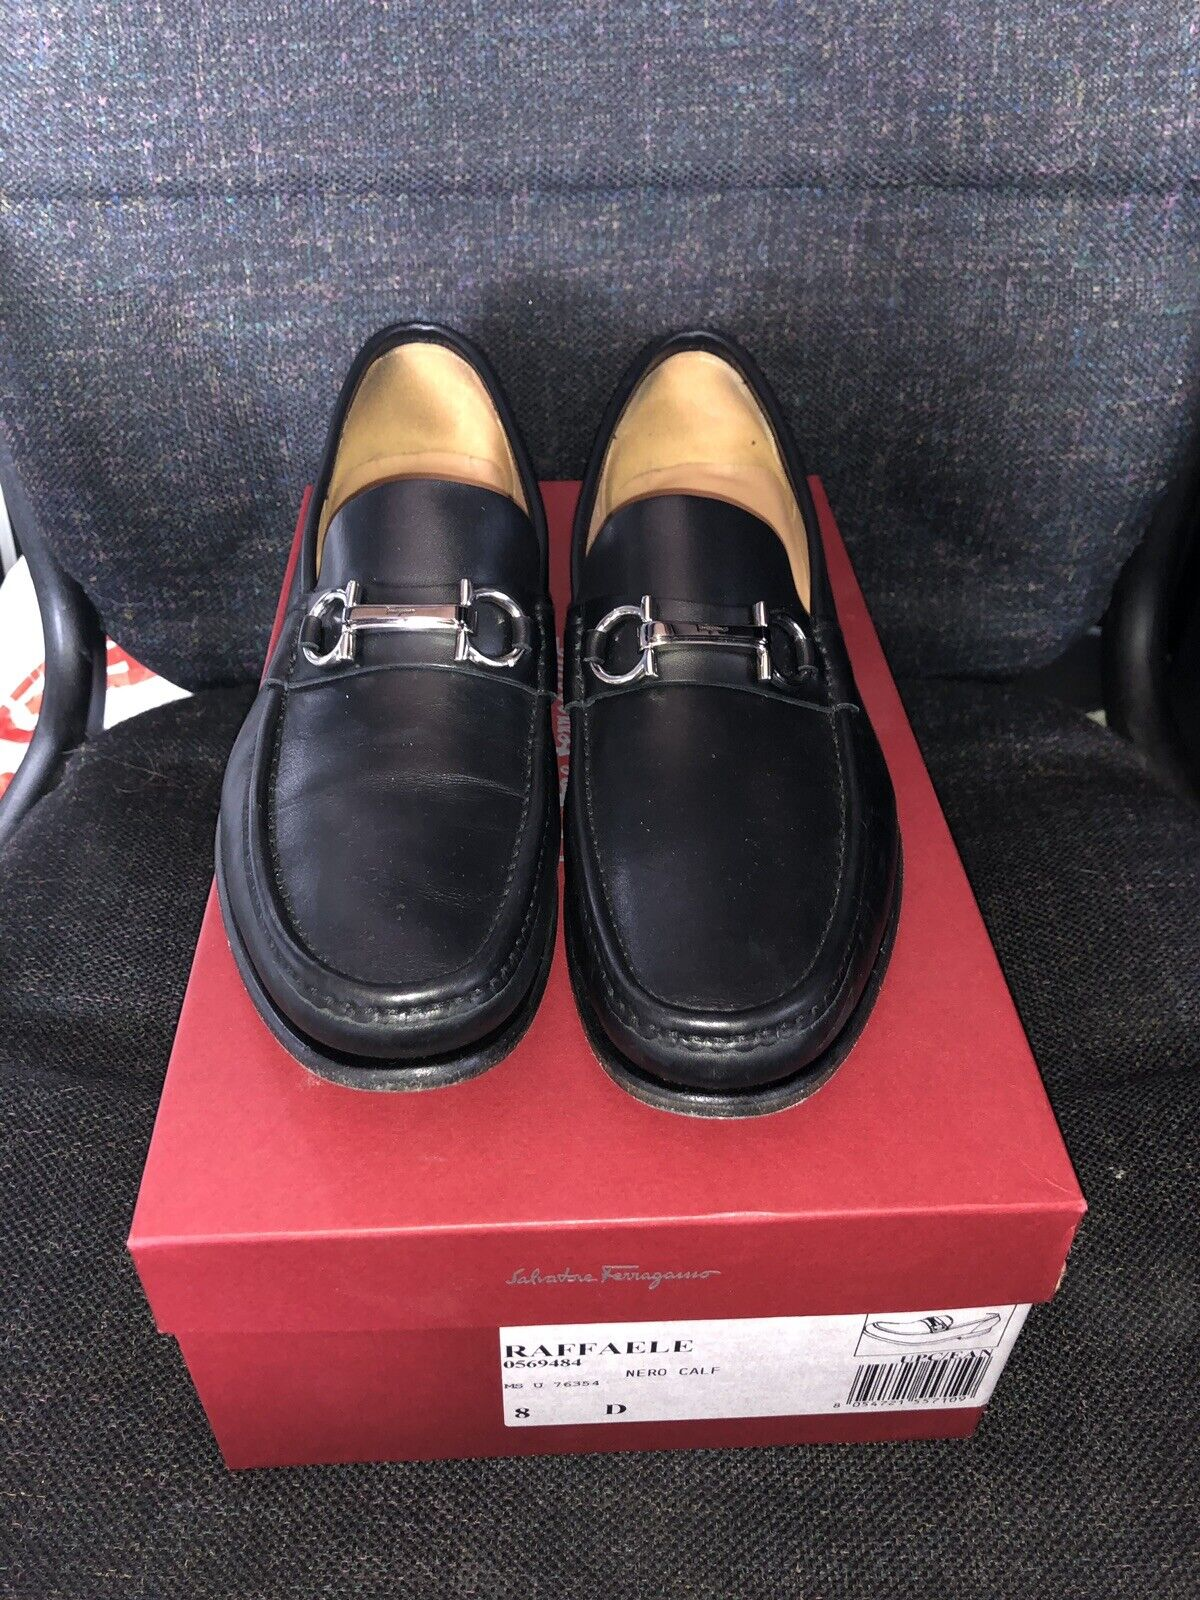 Salvatore  ferragamo Raffaele nero Leather Lofer Dimensione US 8 D  alta quaità